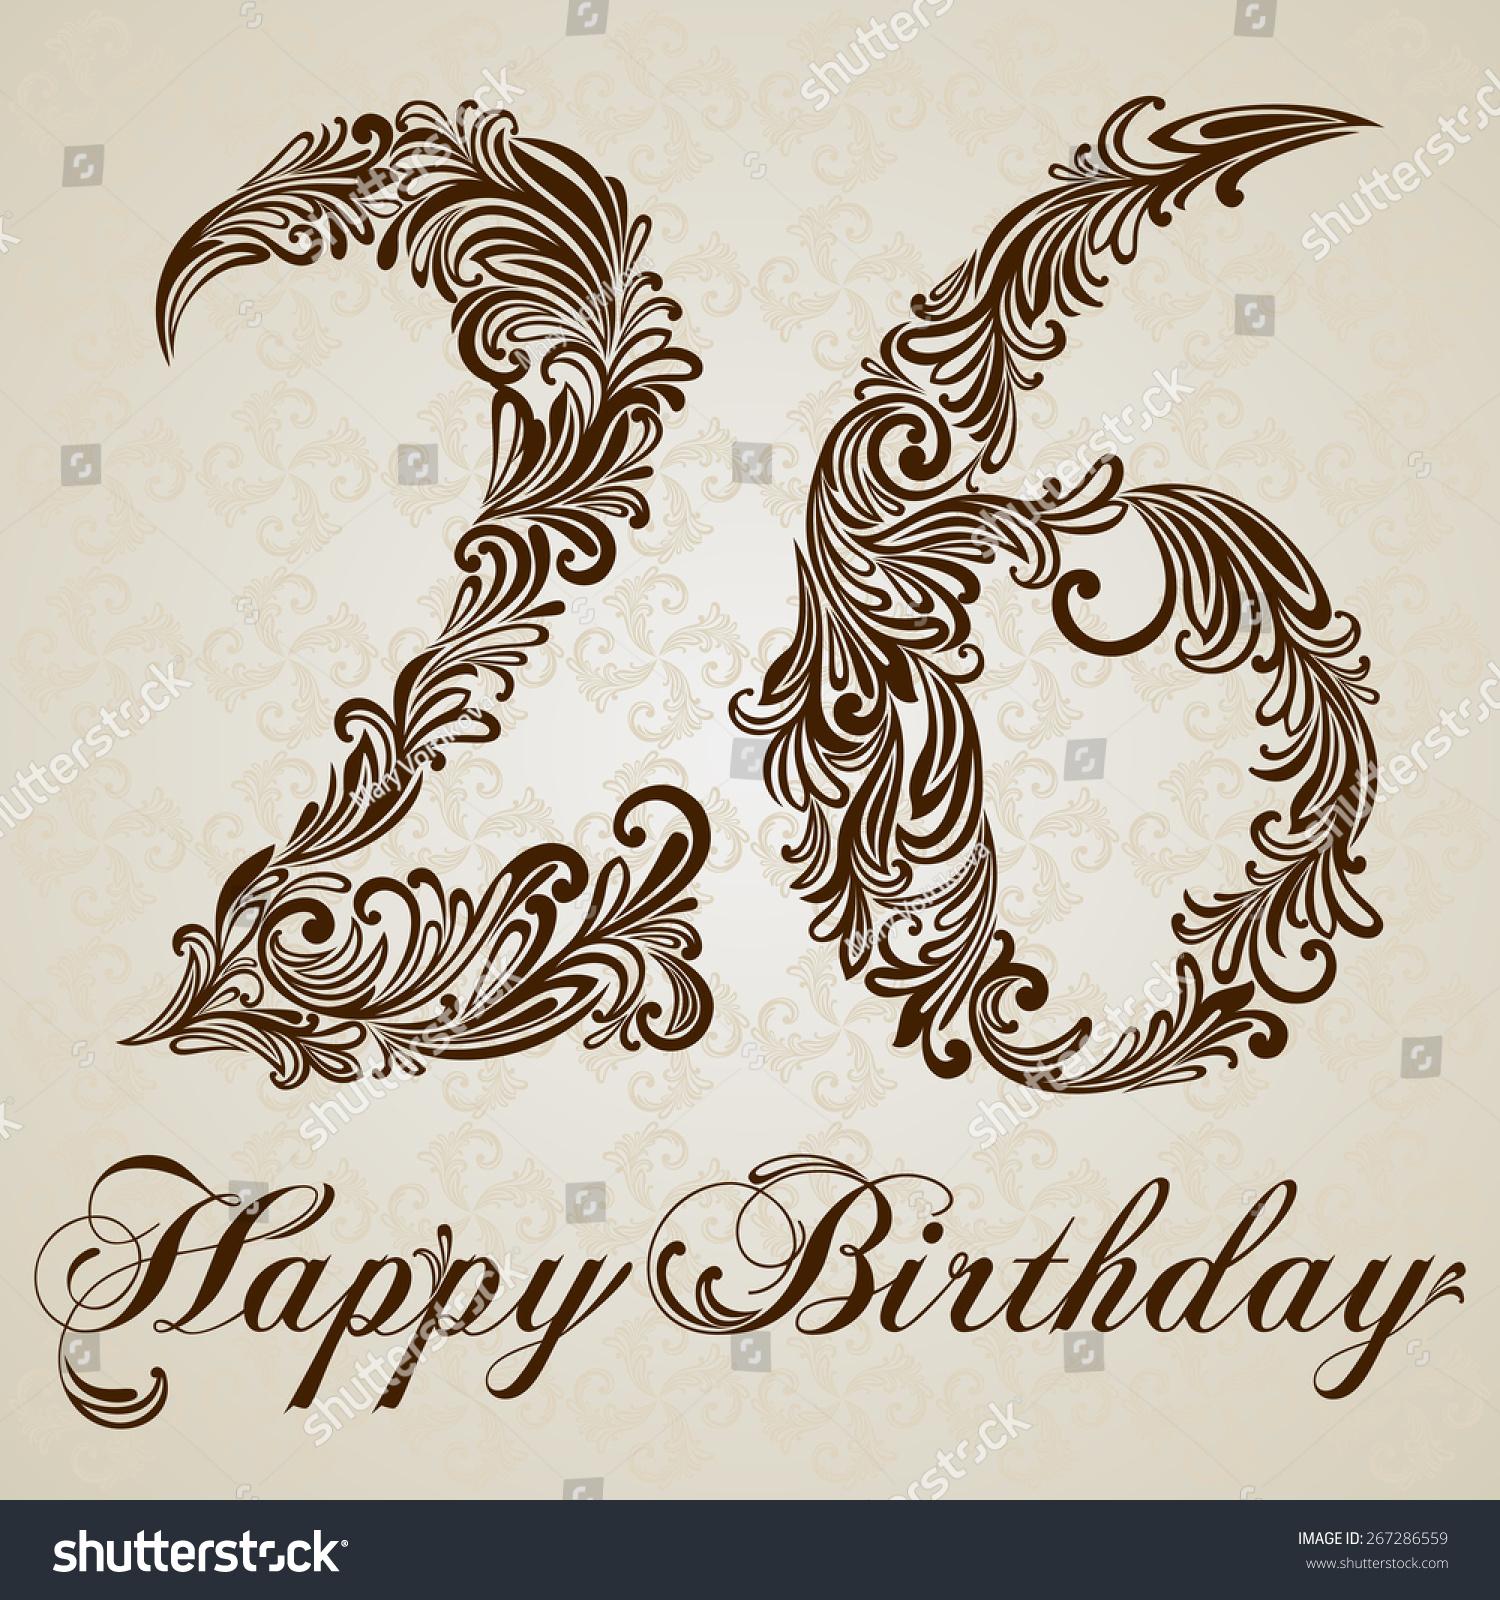 Happy Birthday Card With Number Twenty Six Vector Design Background Swirl Style Illustration